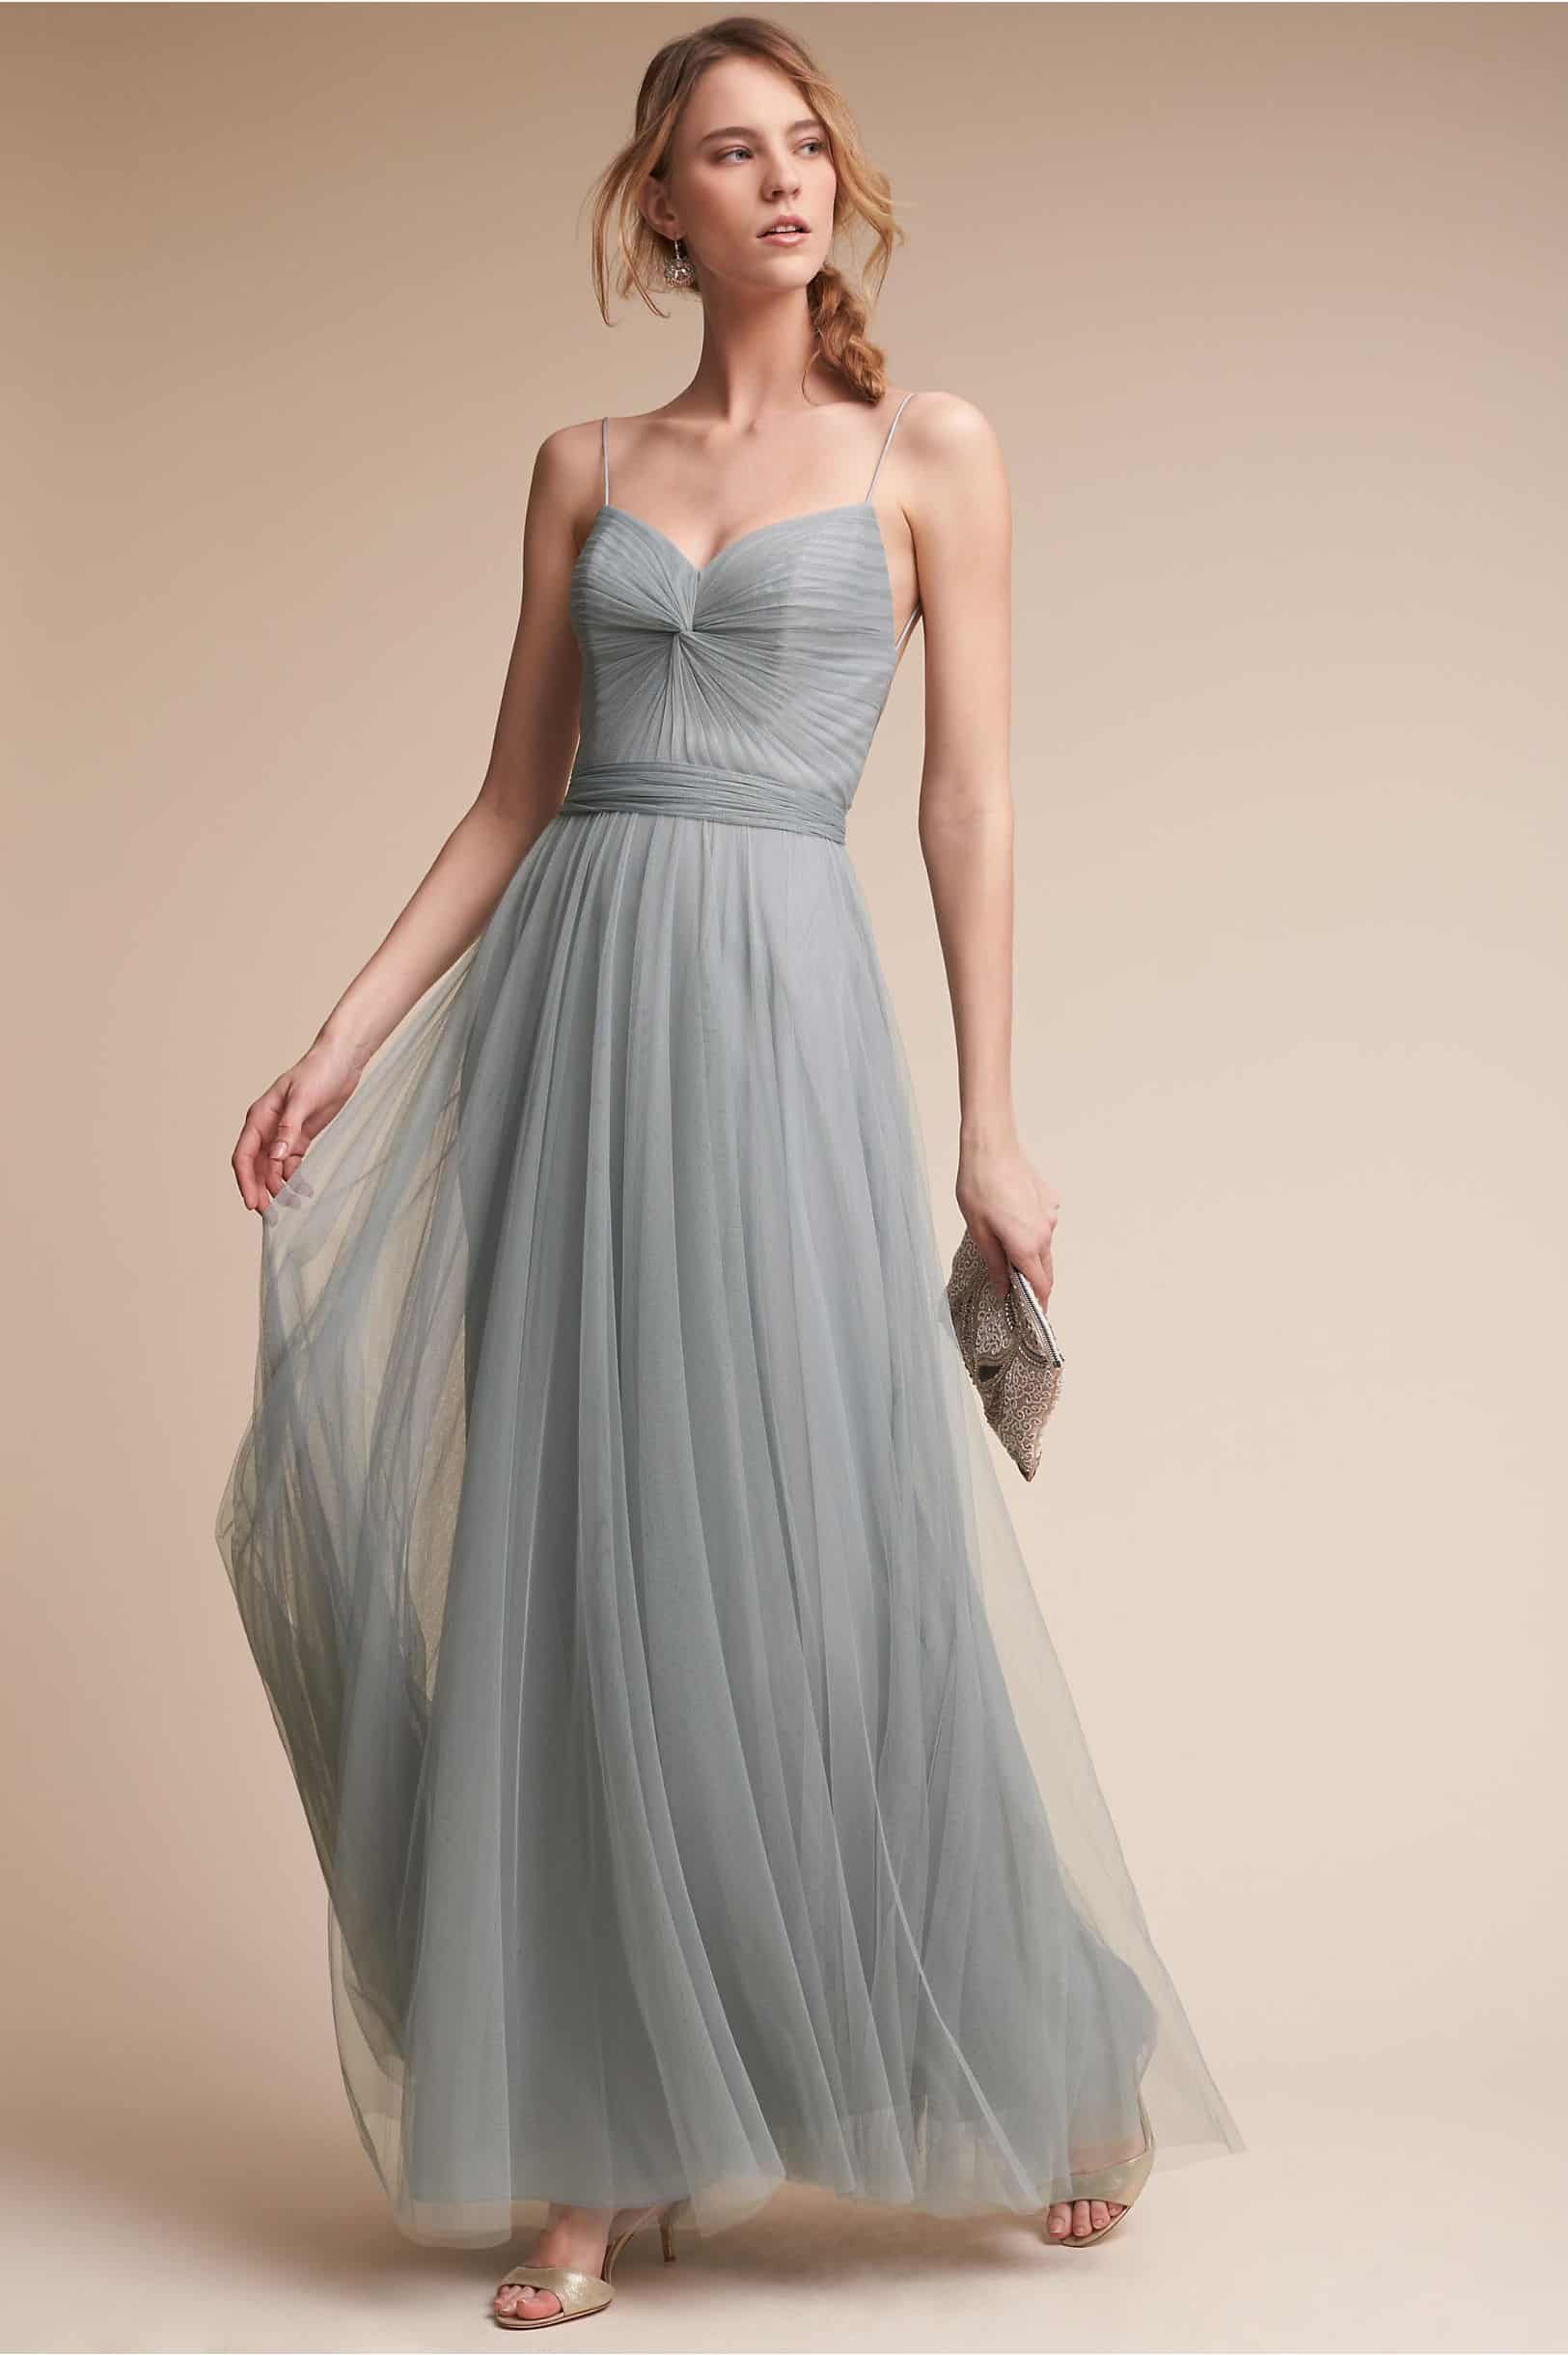 light the c stylish lilac blue order dress flowy latest strapless dresses sweetheart bridesmaid of long maid lighting honor among chiffon